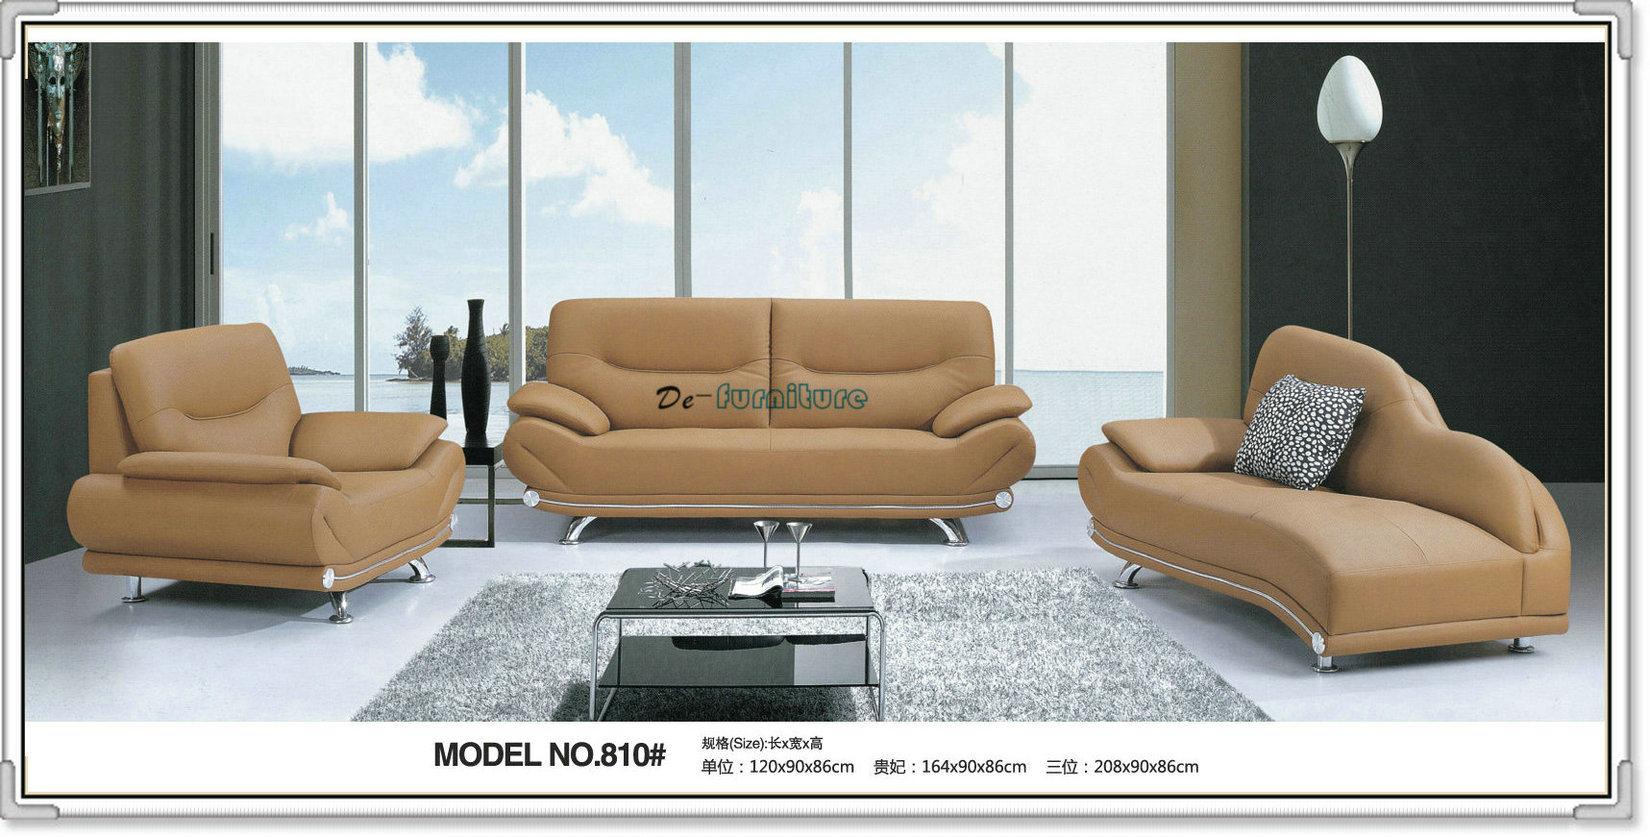 Kuka Home Living Room  Bedroom  Dining Room Upholstered